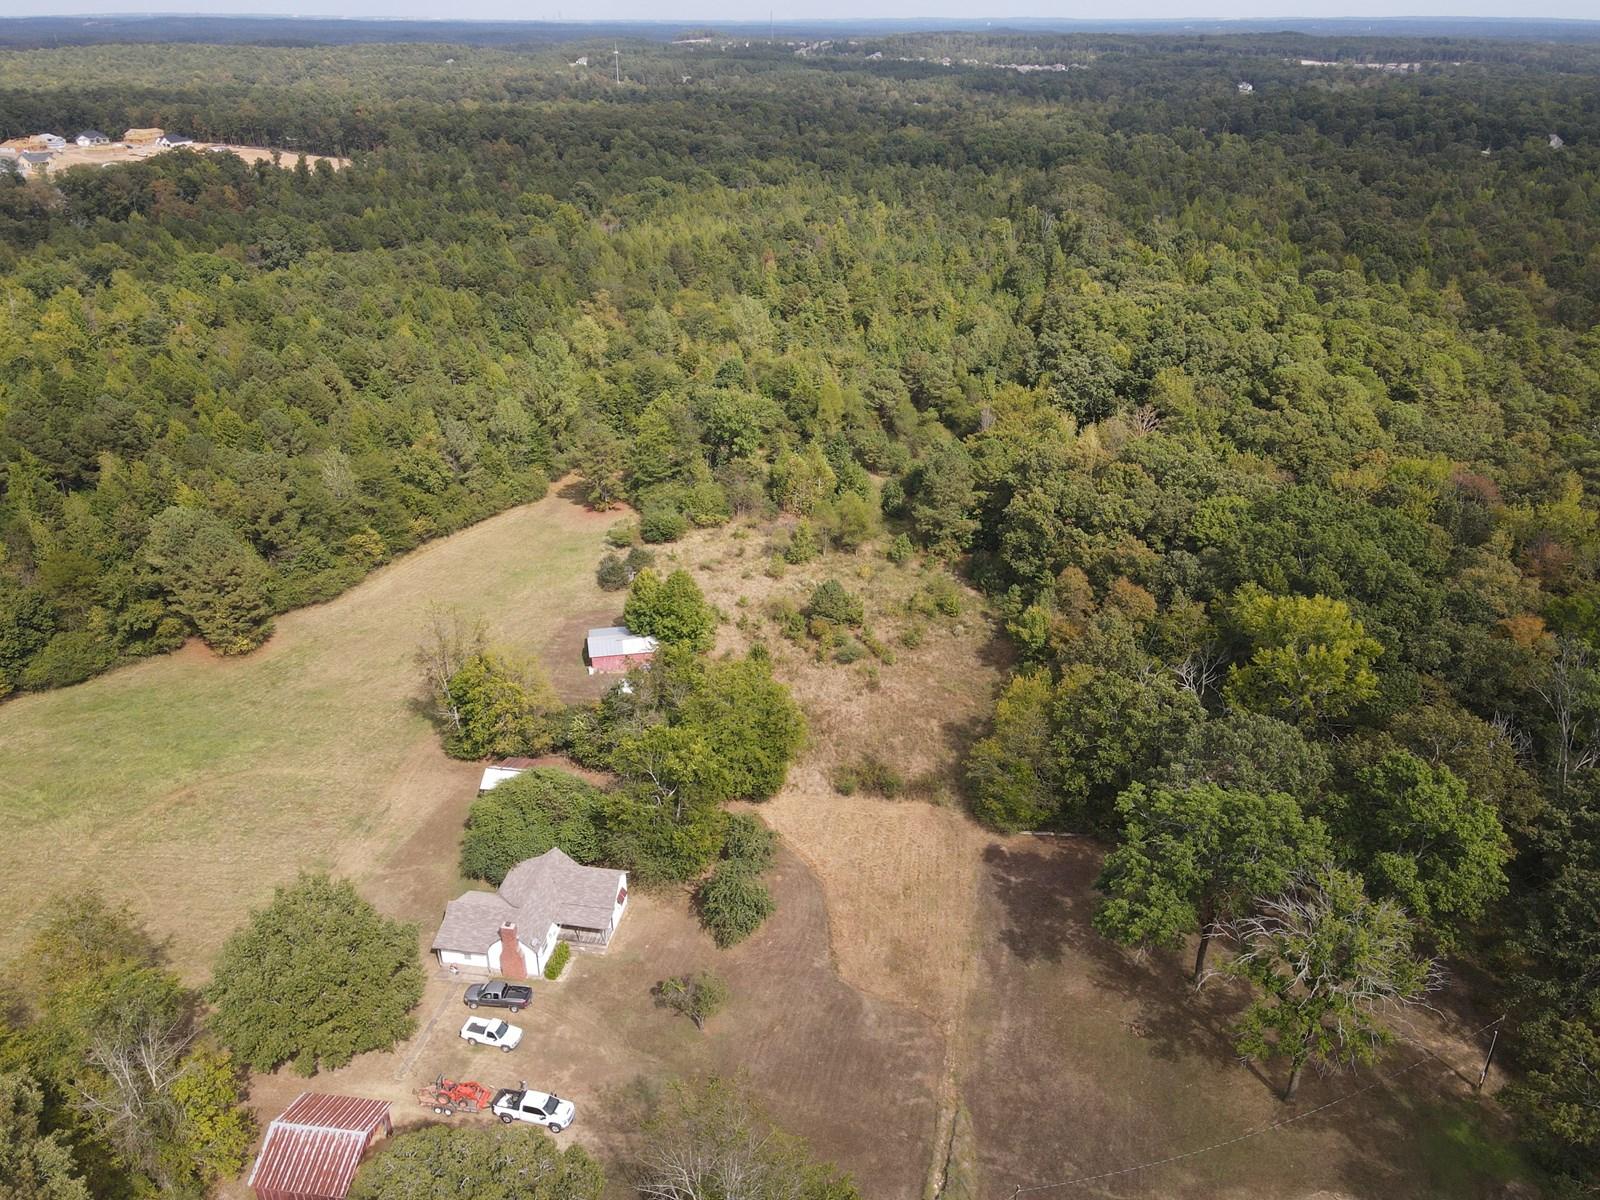 Development Land in Saline County Arkansas